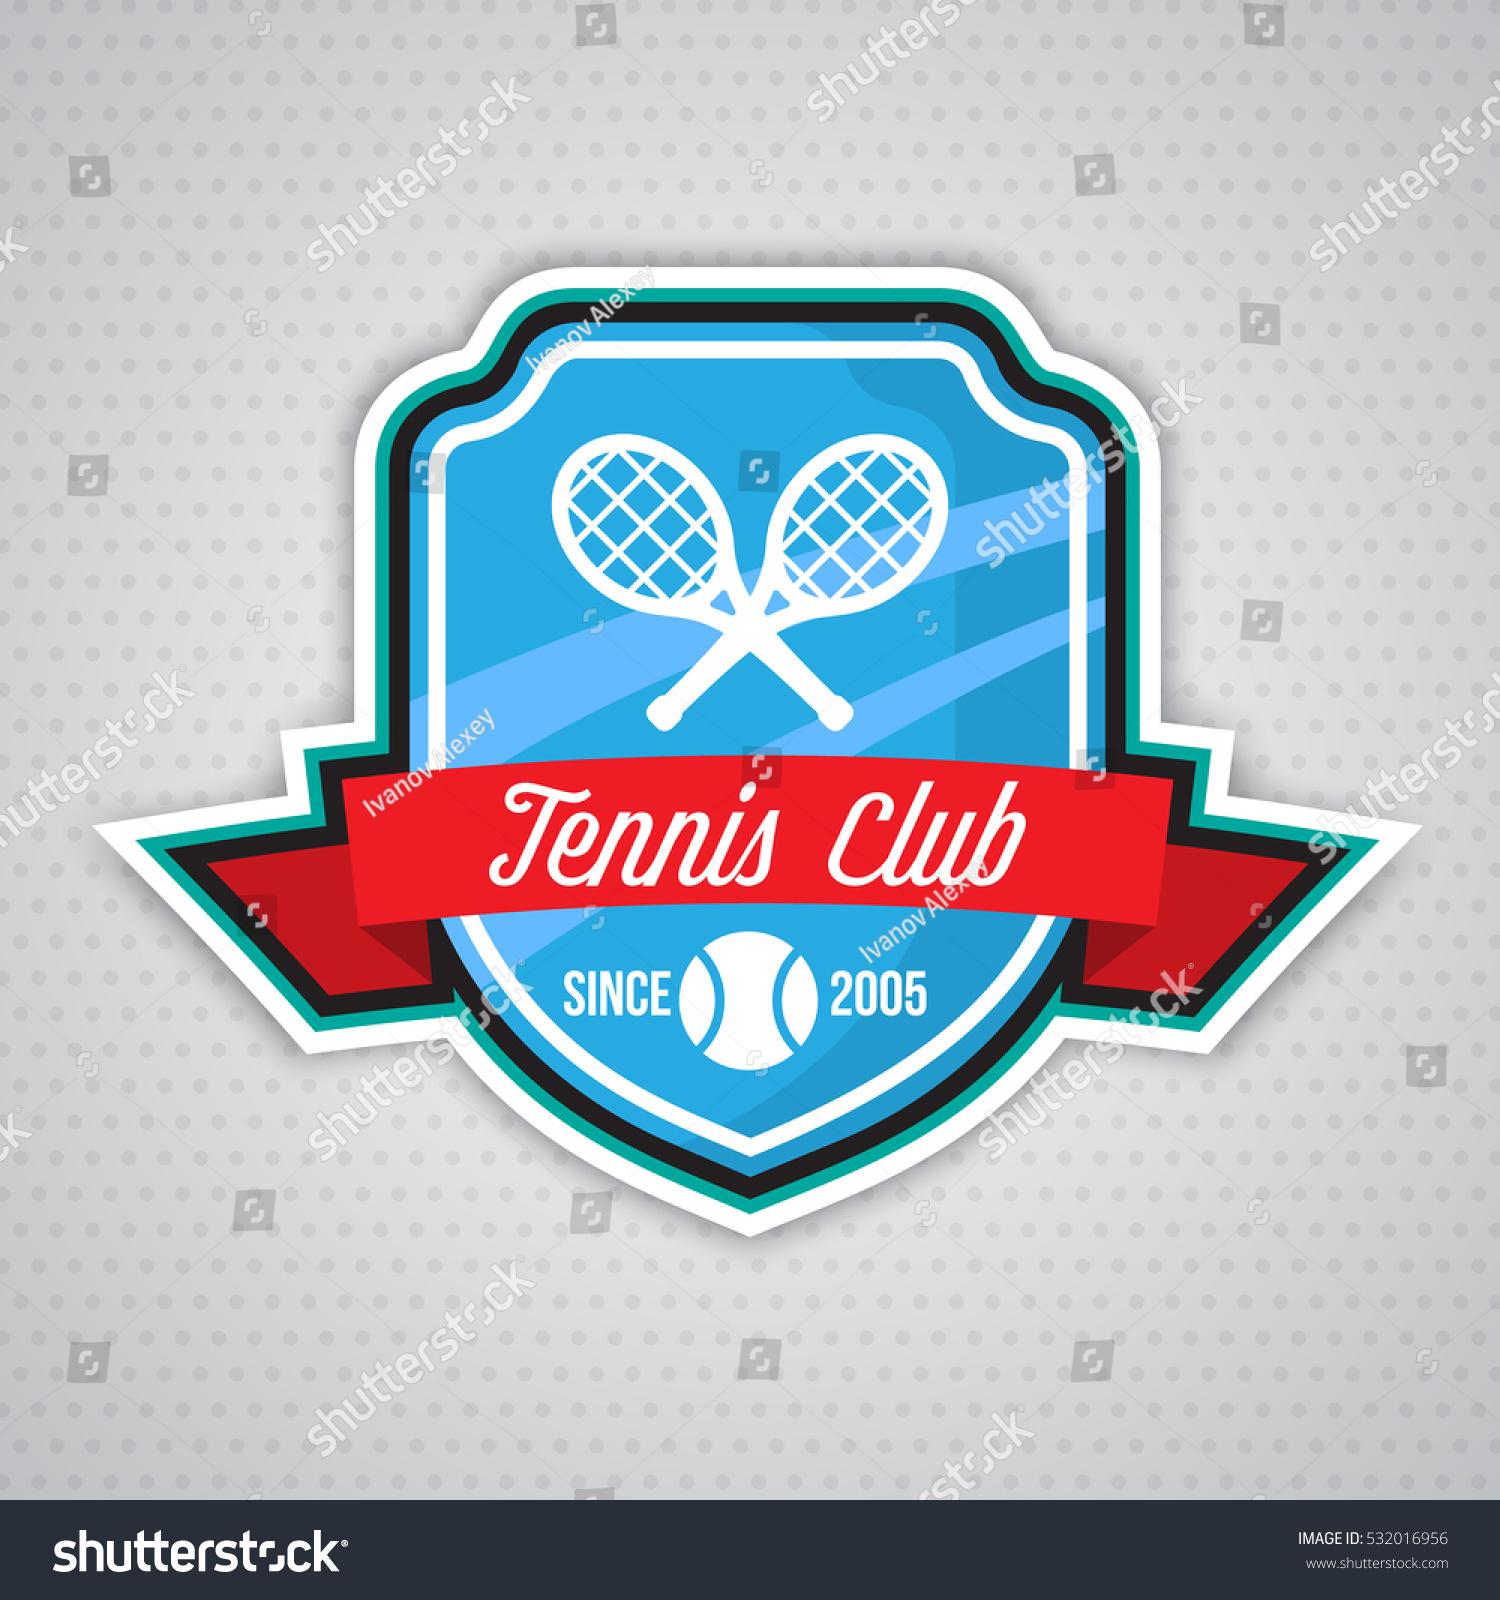 Tennis Badge Logo Templatesport Tshirt Graphics Stock Vector Royalty Free 532016956,Short Diamond Mangalsutra Designs Latest